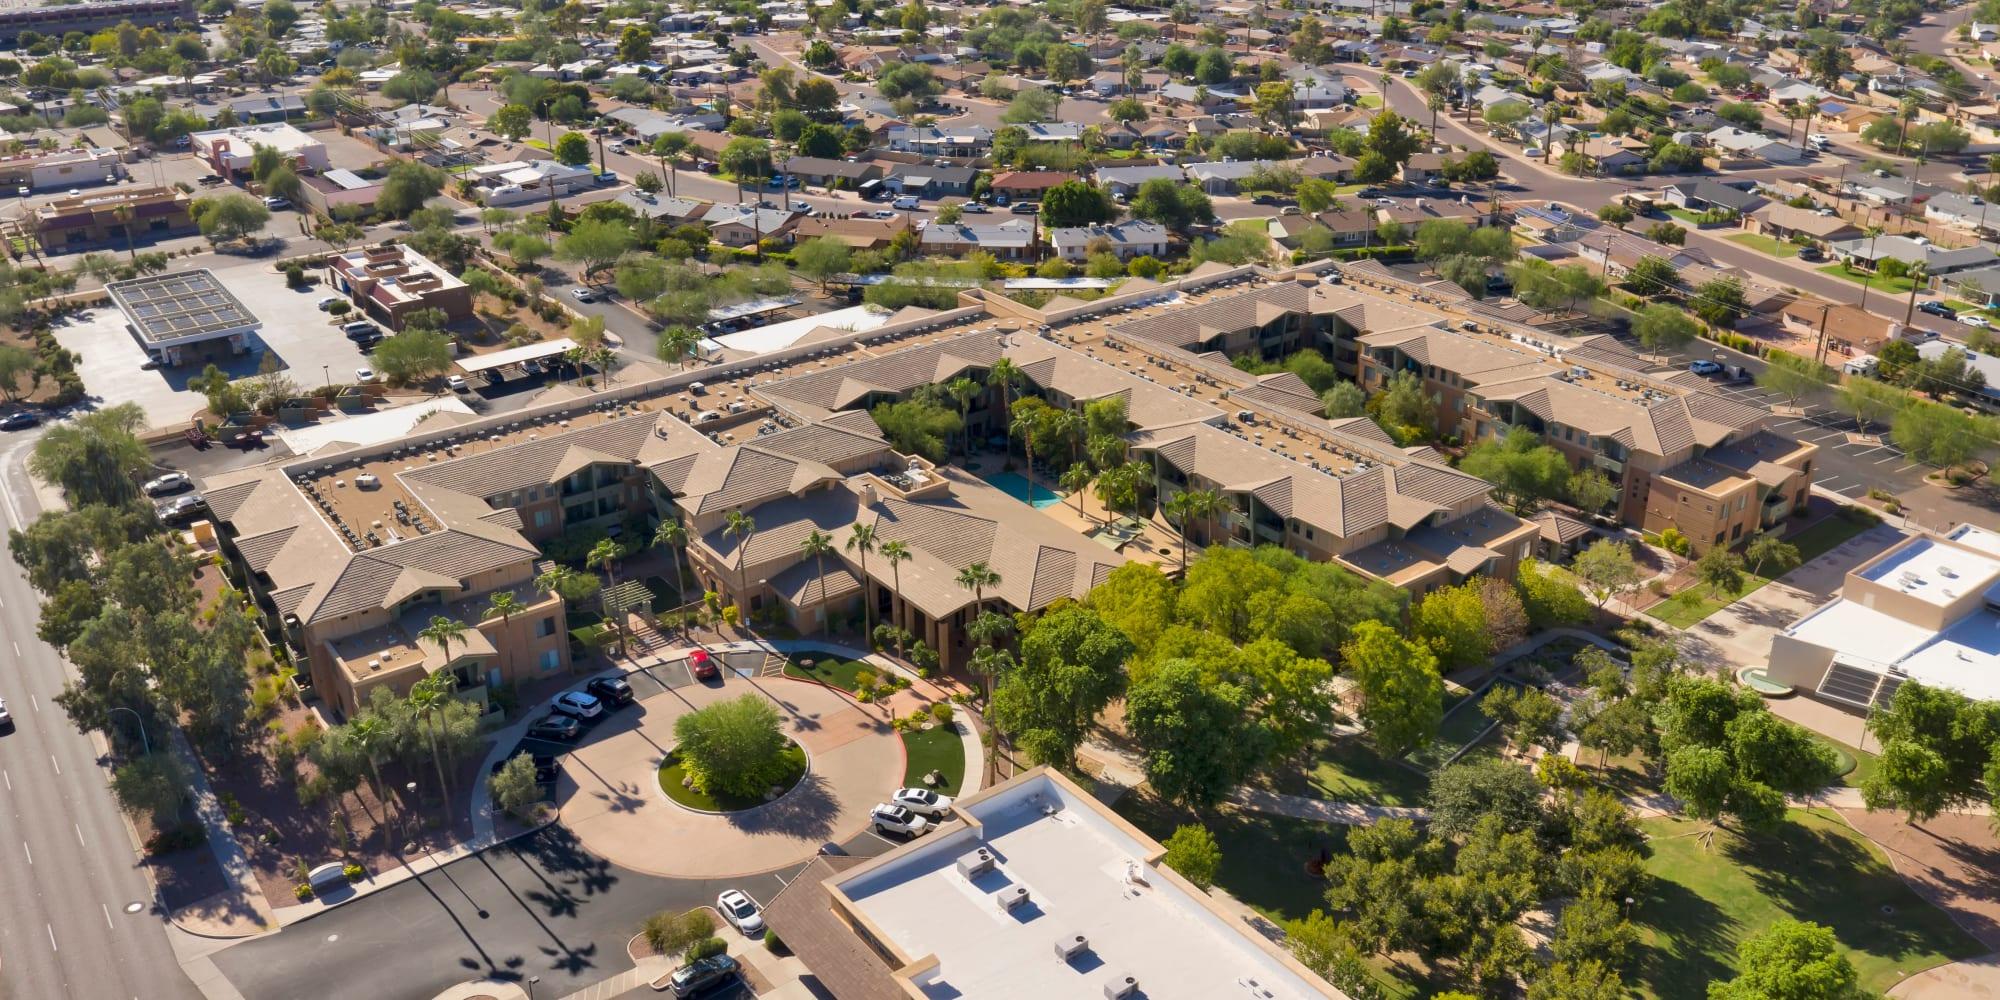 Aerial shot of McDowell Village in Scottsdale, Arizona